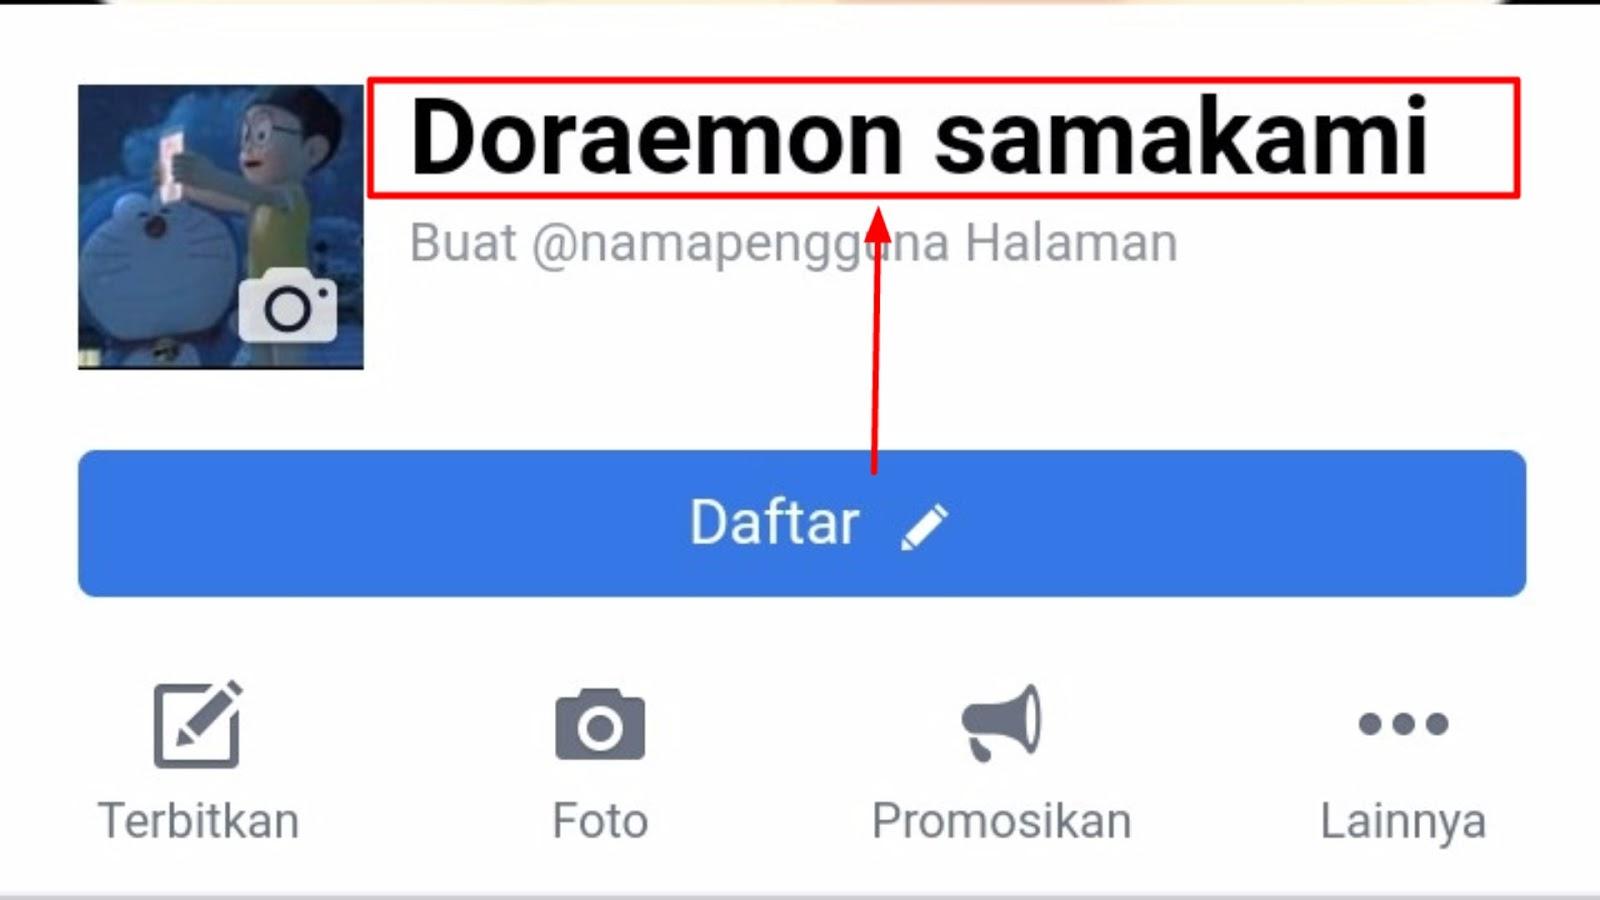 Cara mengubah dan mengangganti nama fp facebook